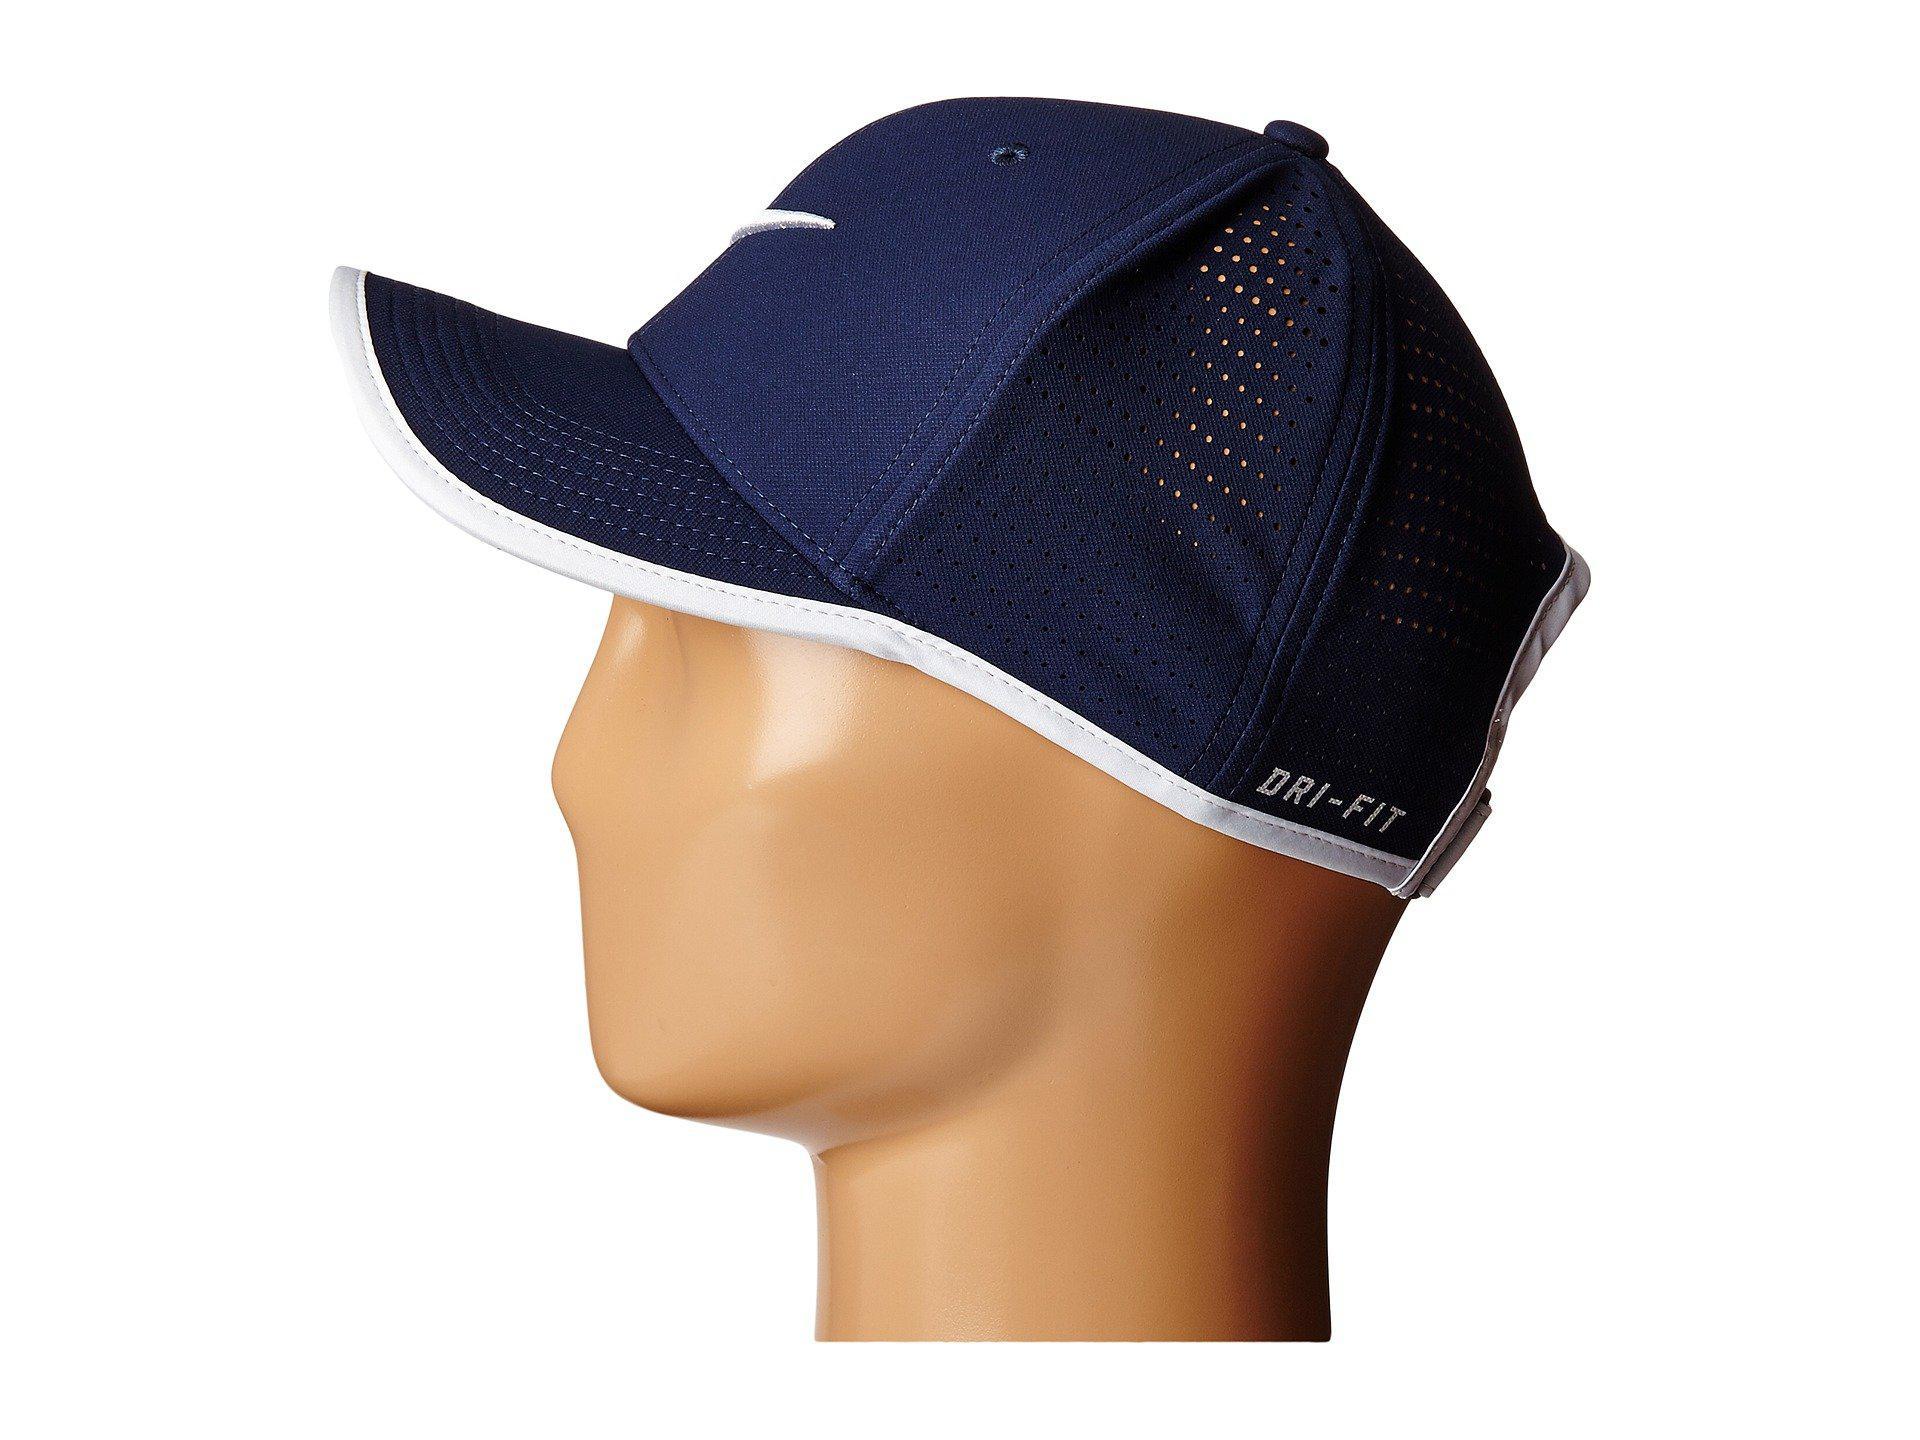 Lyst - Nike Train Vapor Classic 99 Hat in Blue for Men d010c1908bc7